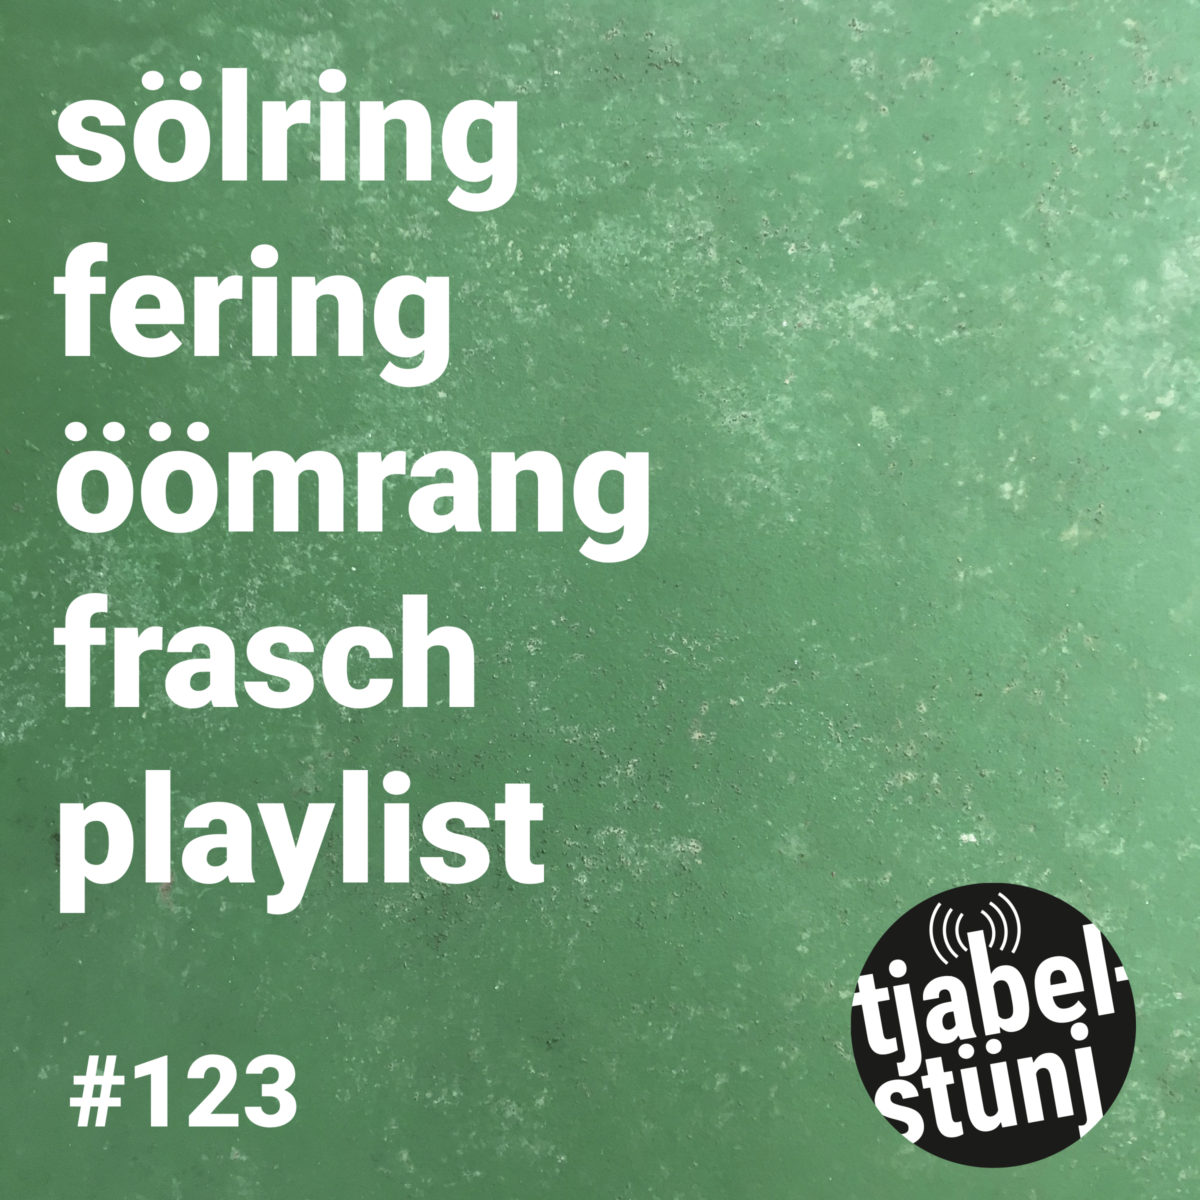 Playlist #123